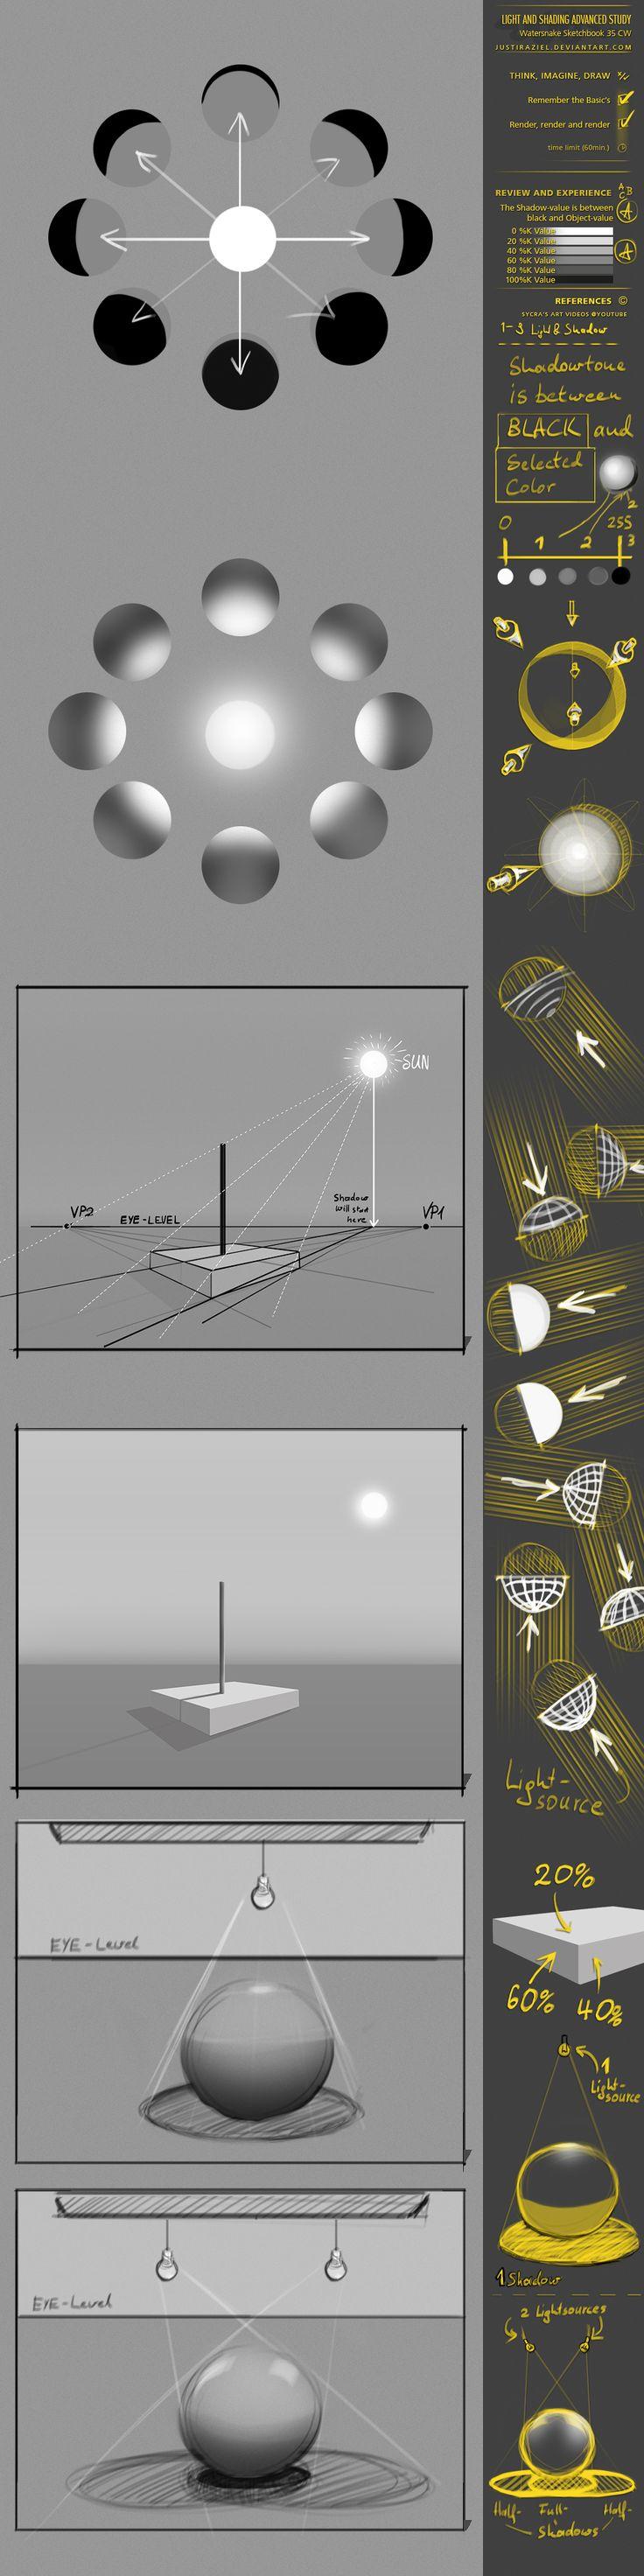 CW35 Light study by JustIRaziel.deviantart.com on @deviantART